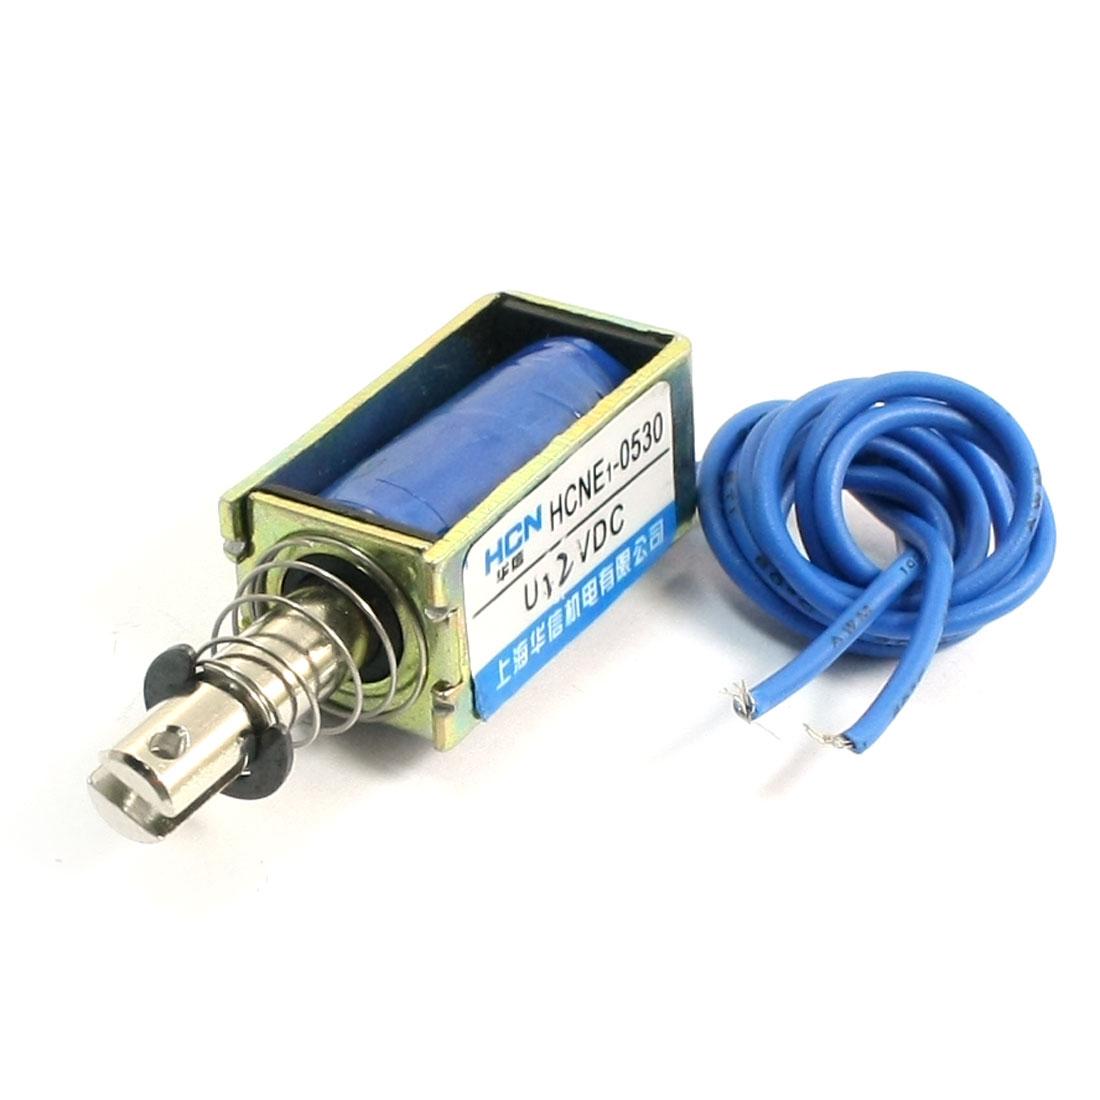 5N Force 10mm StrokePull Actuator Linear Electromagnet Solenoid DC 12V